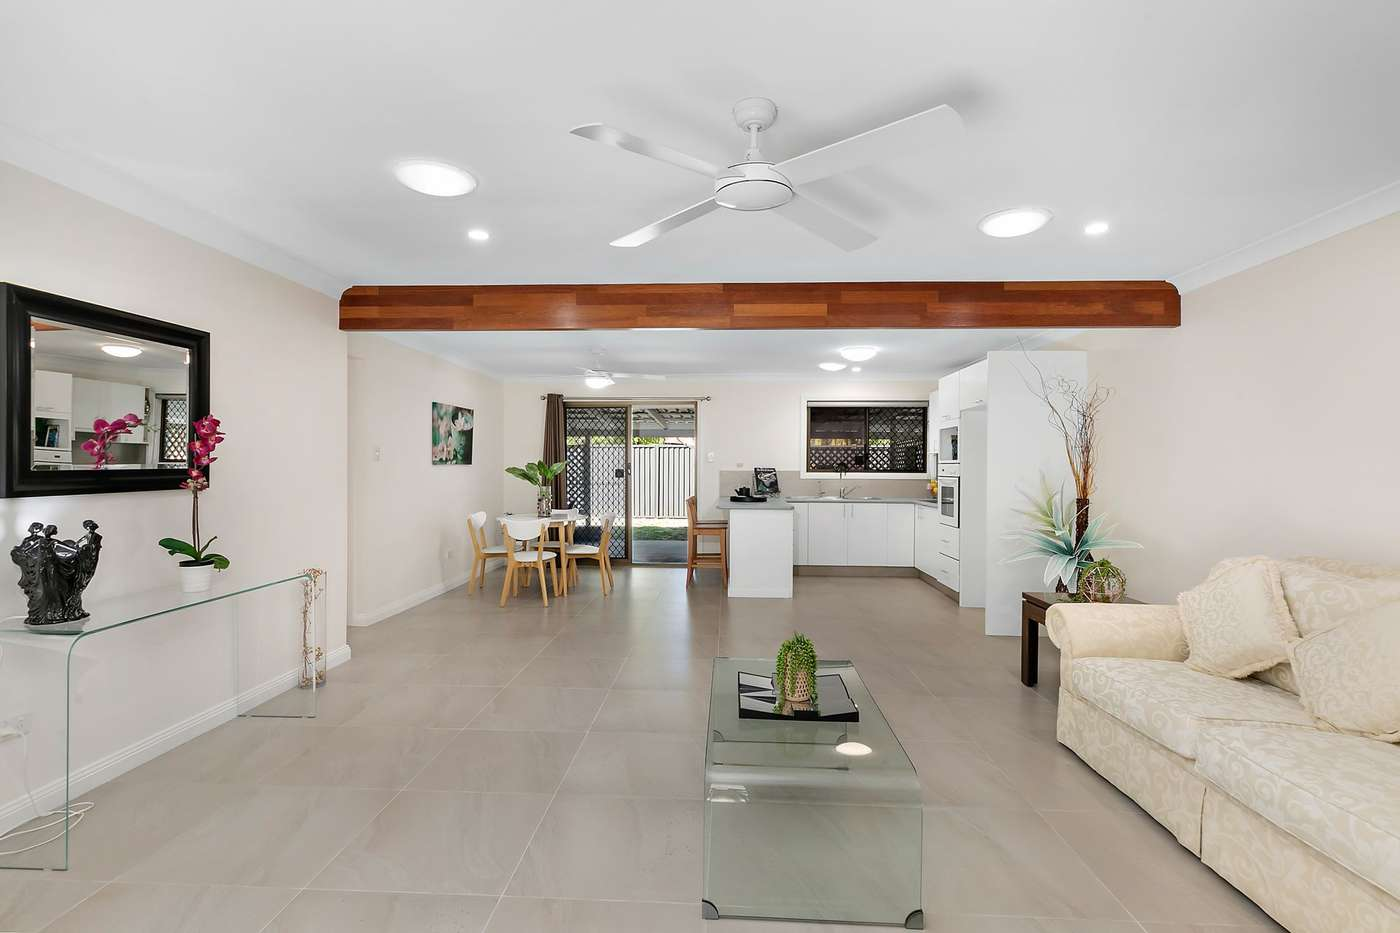 Main view of Homely house listing, 193 Mooroondu Road, Thorneside, QLD 4158